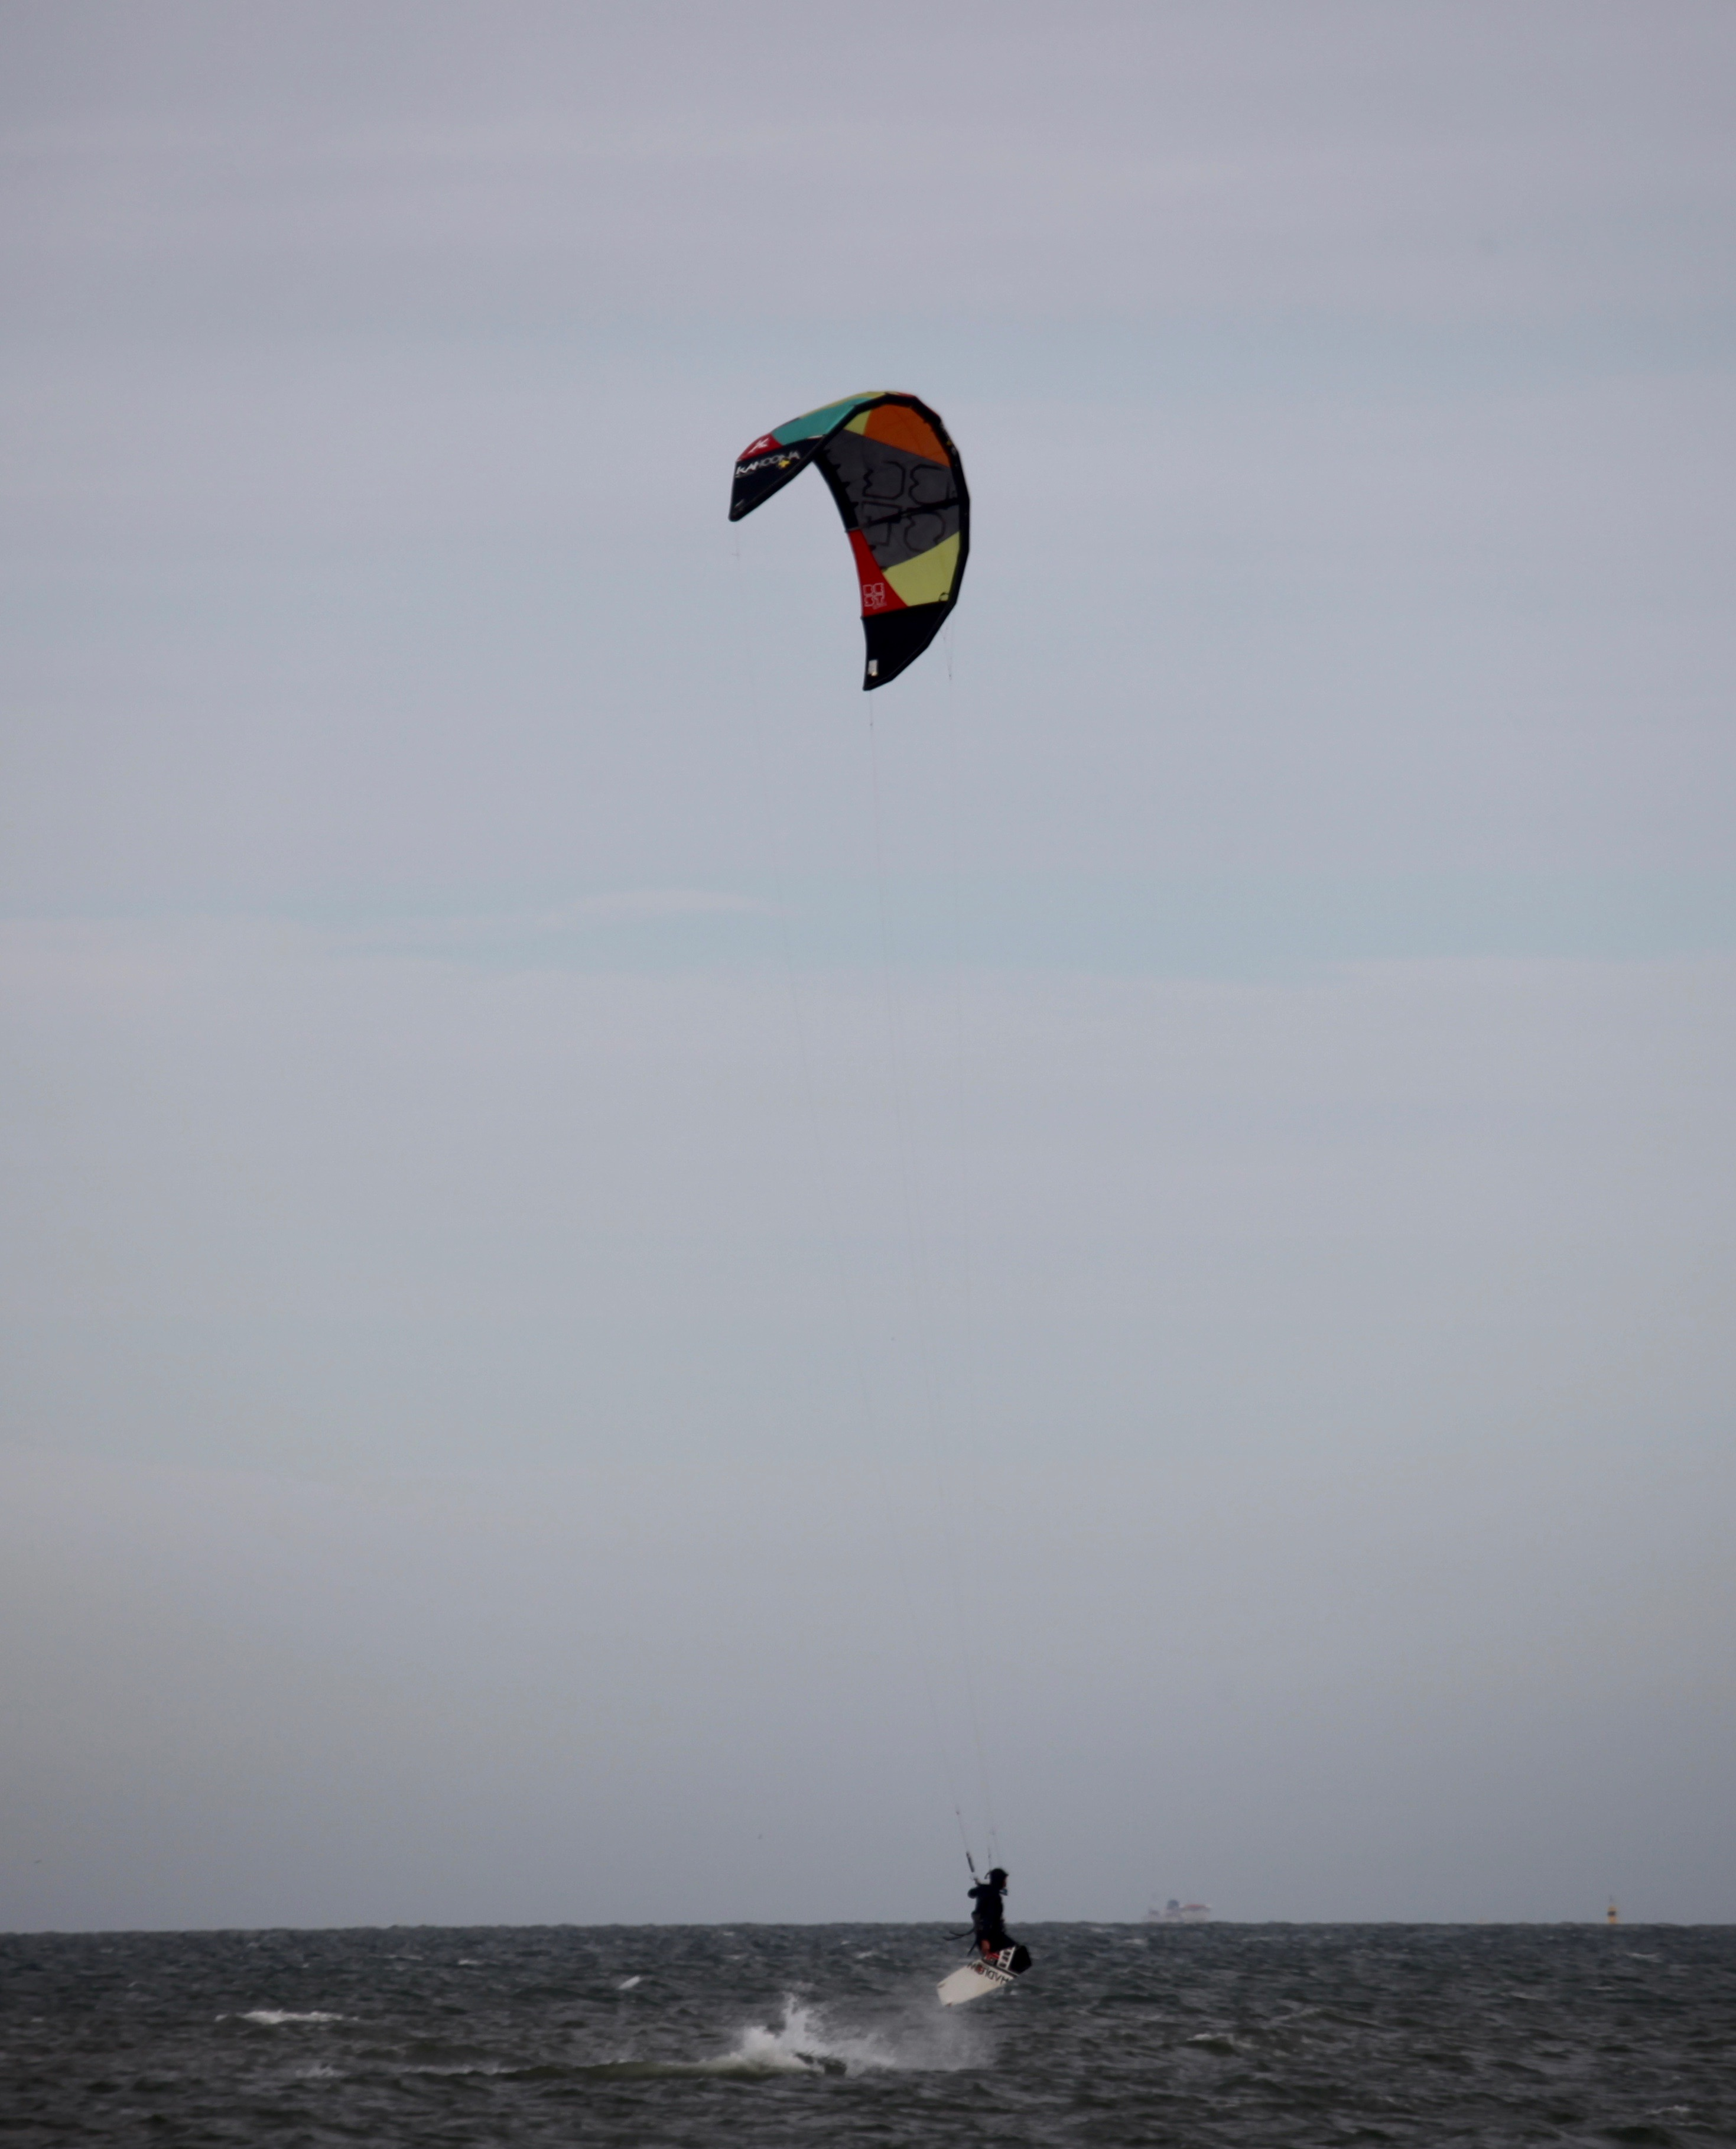 Wind surfer in air